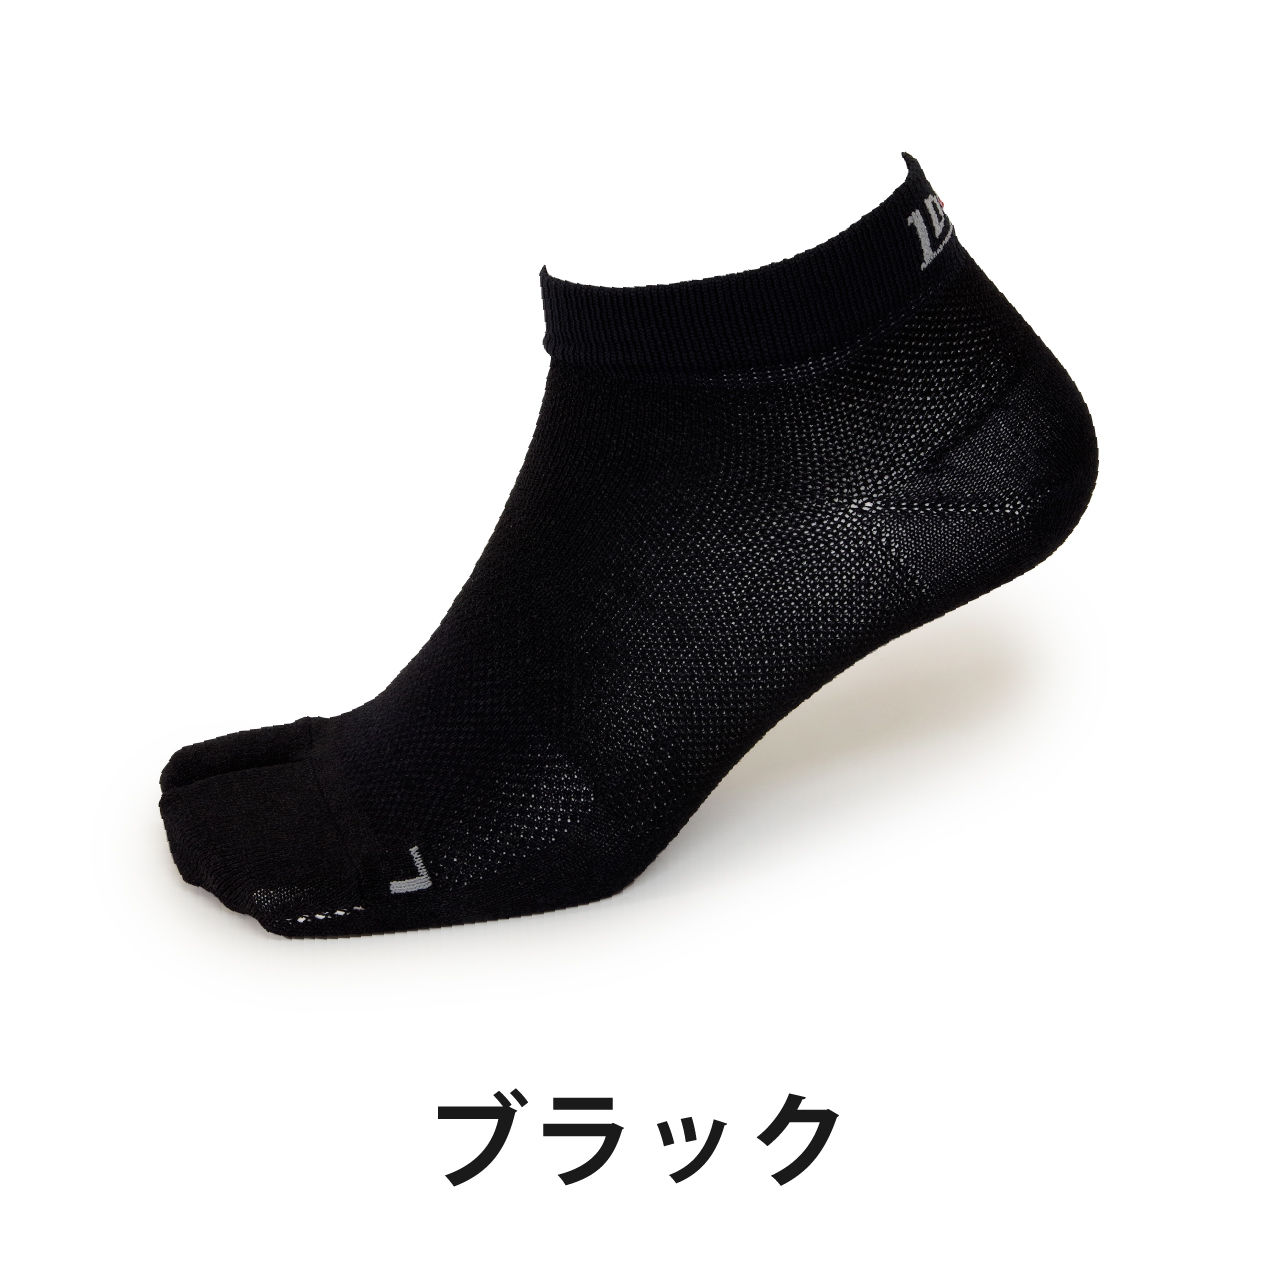 IDATEN足袋コンプレッション和紙ソックスショート丈(Mサイズ24-26cm)